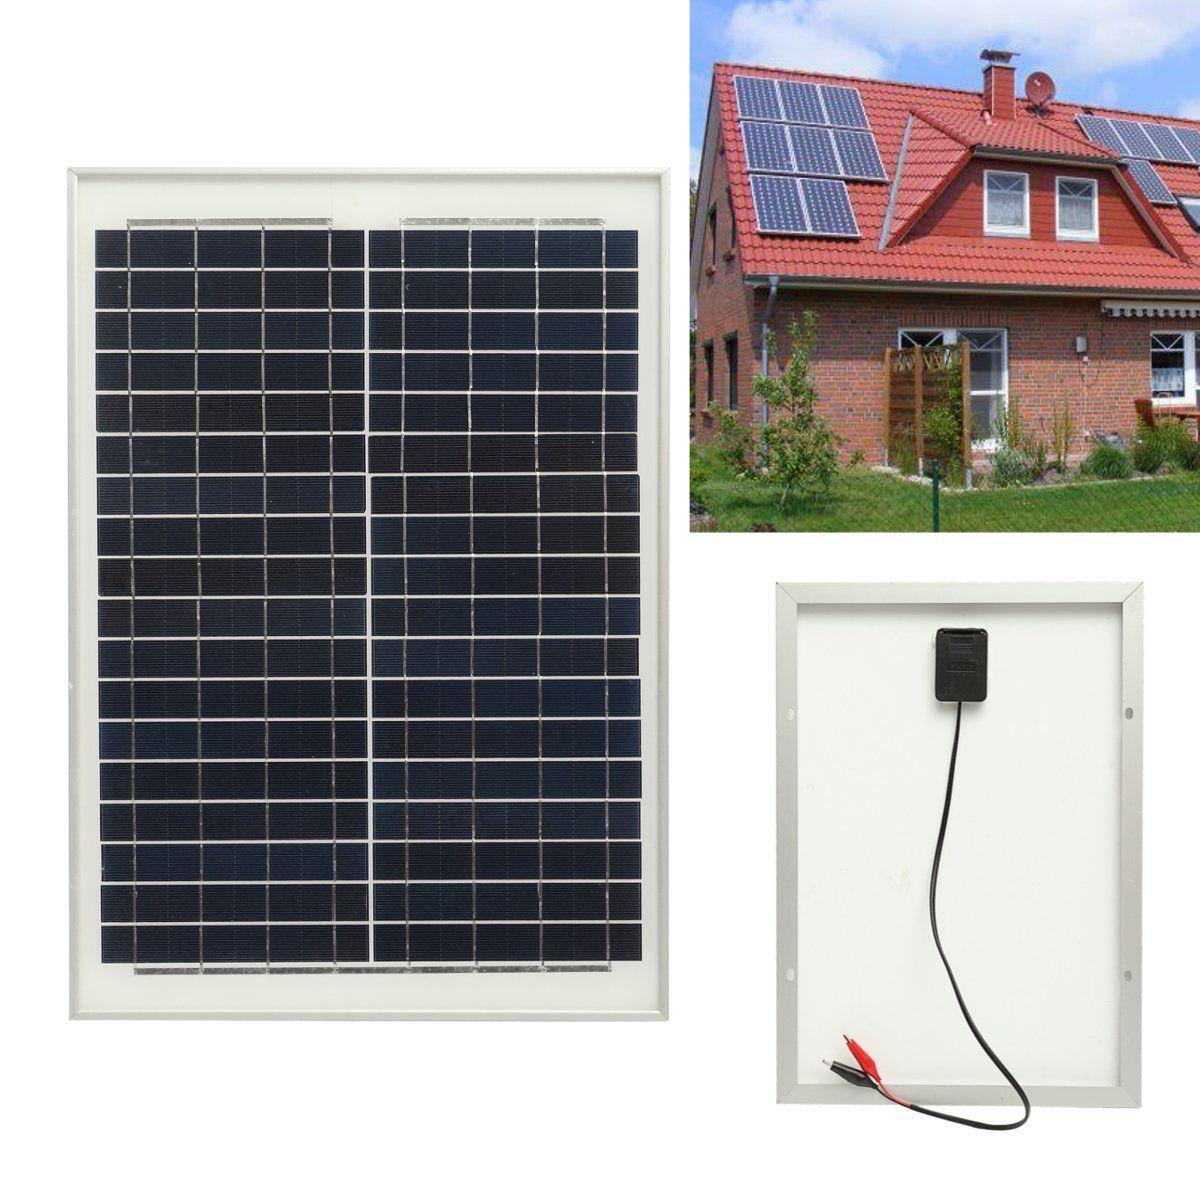 diy solar panel kits for sale